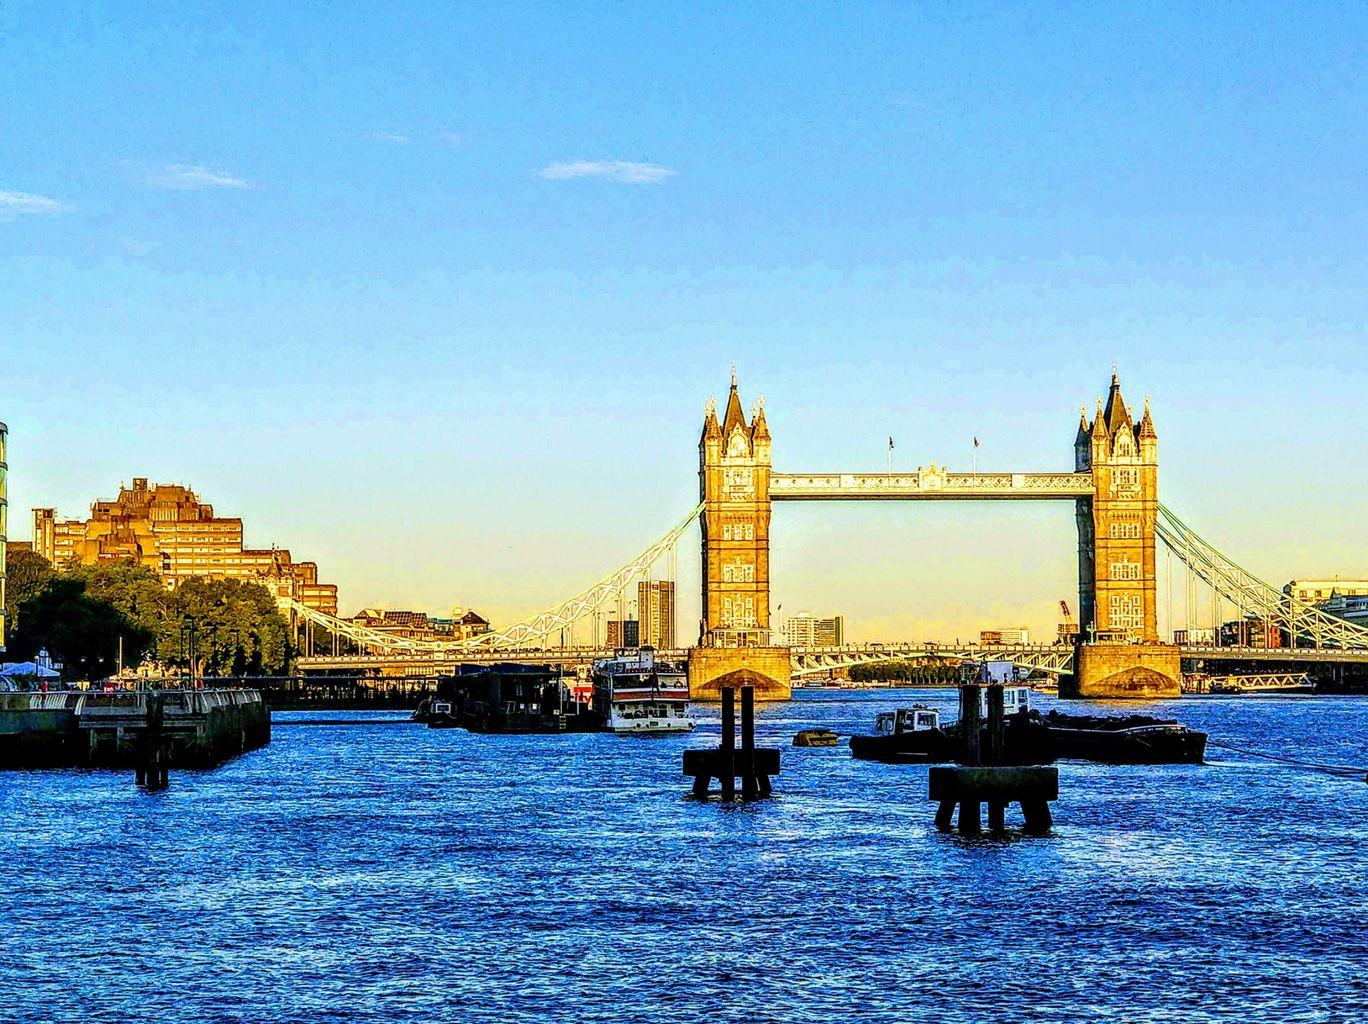 Photo of Tower Bridge By Ishu Choudhary